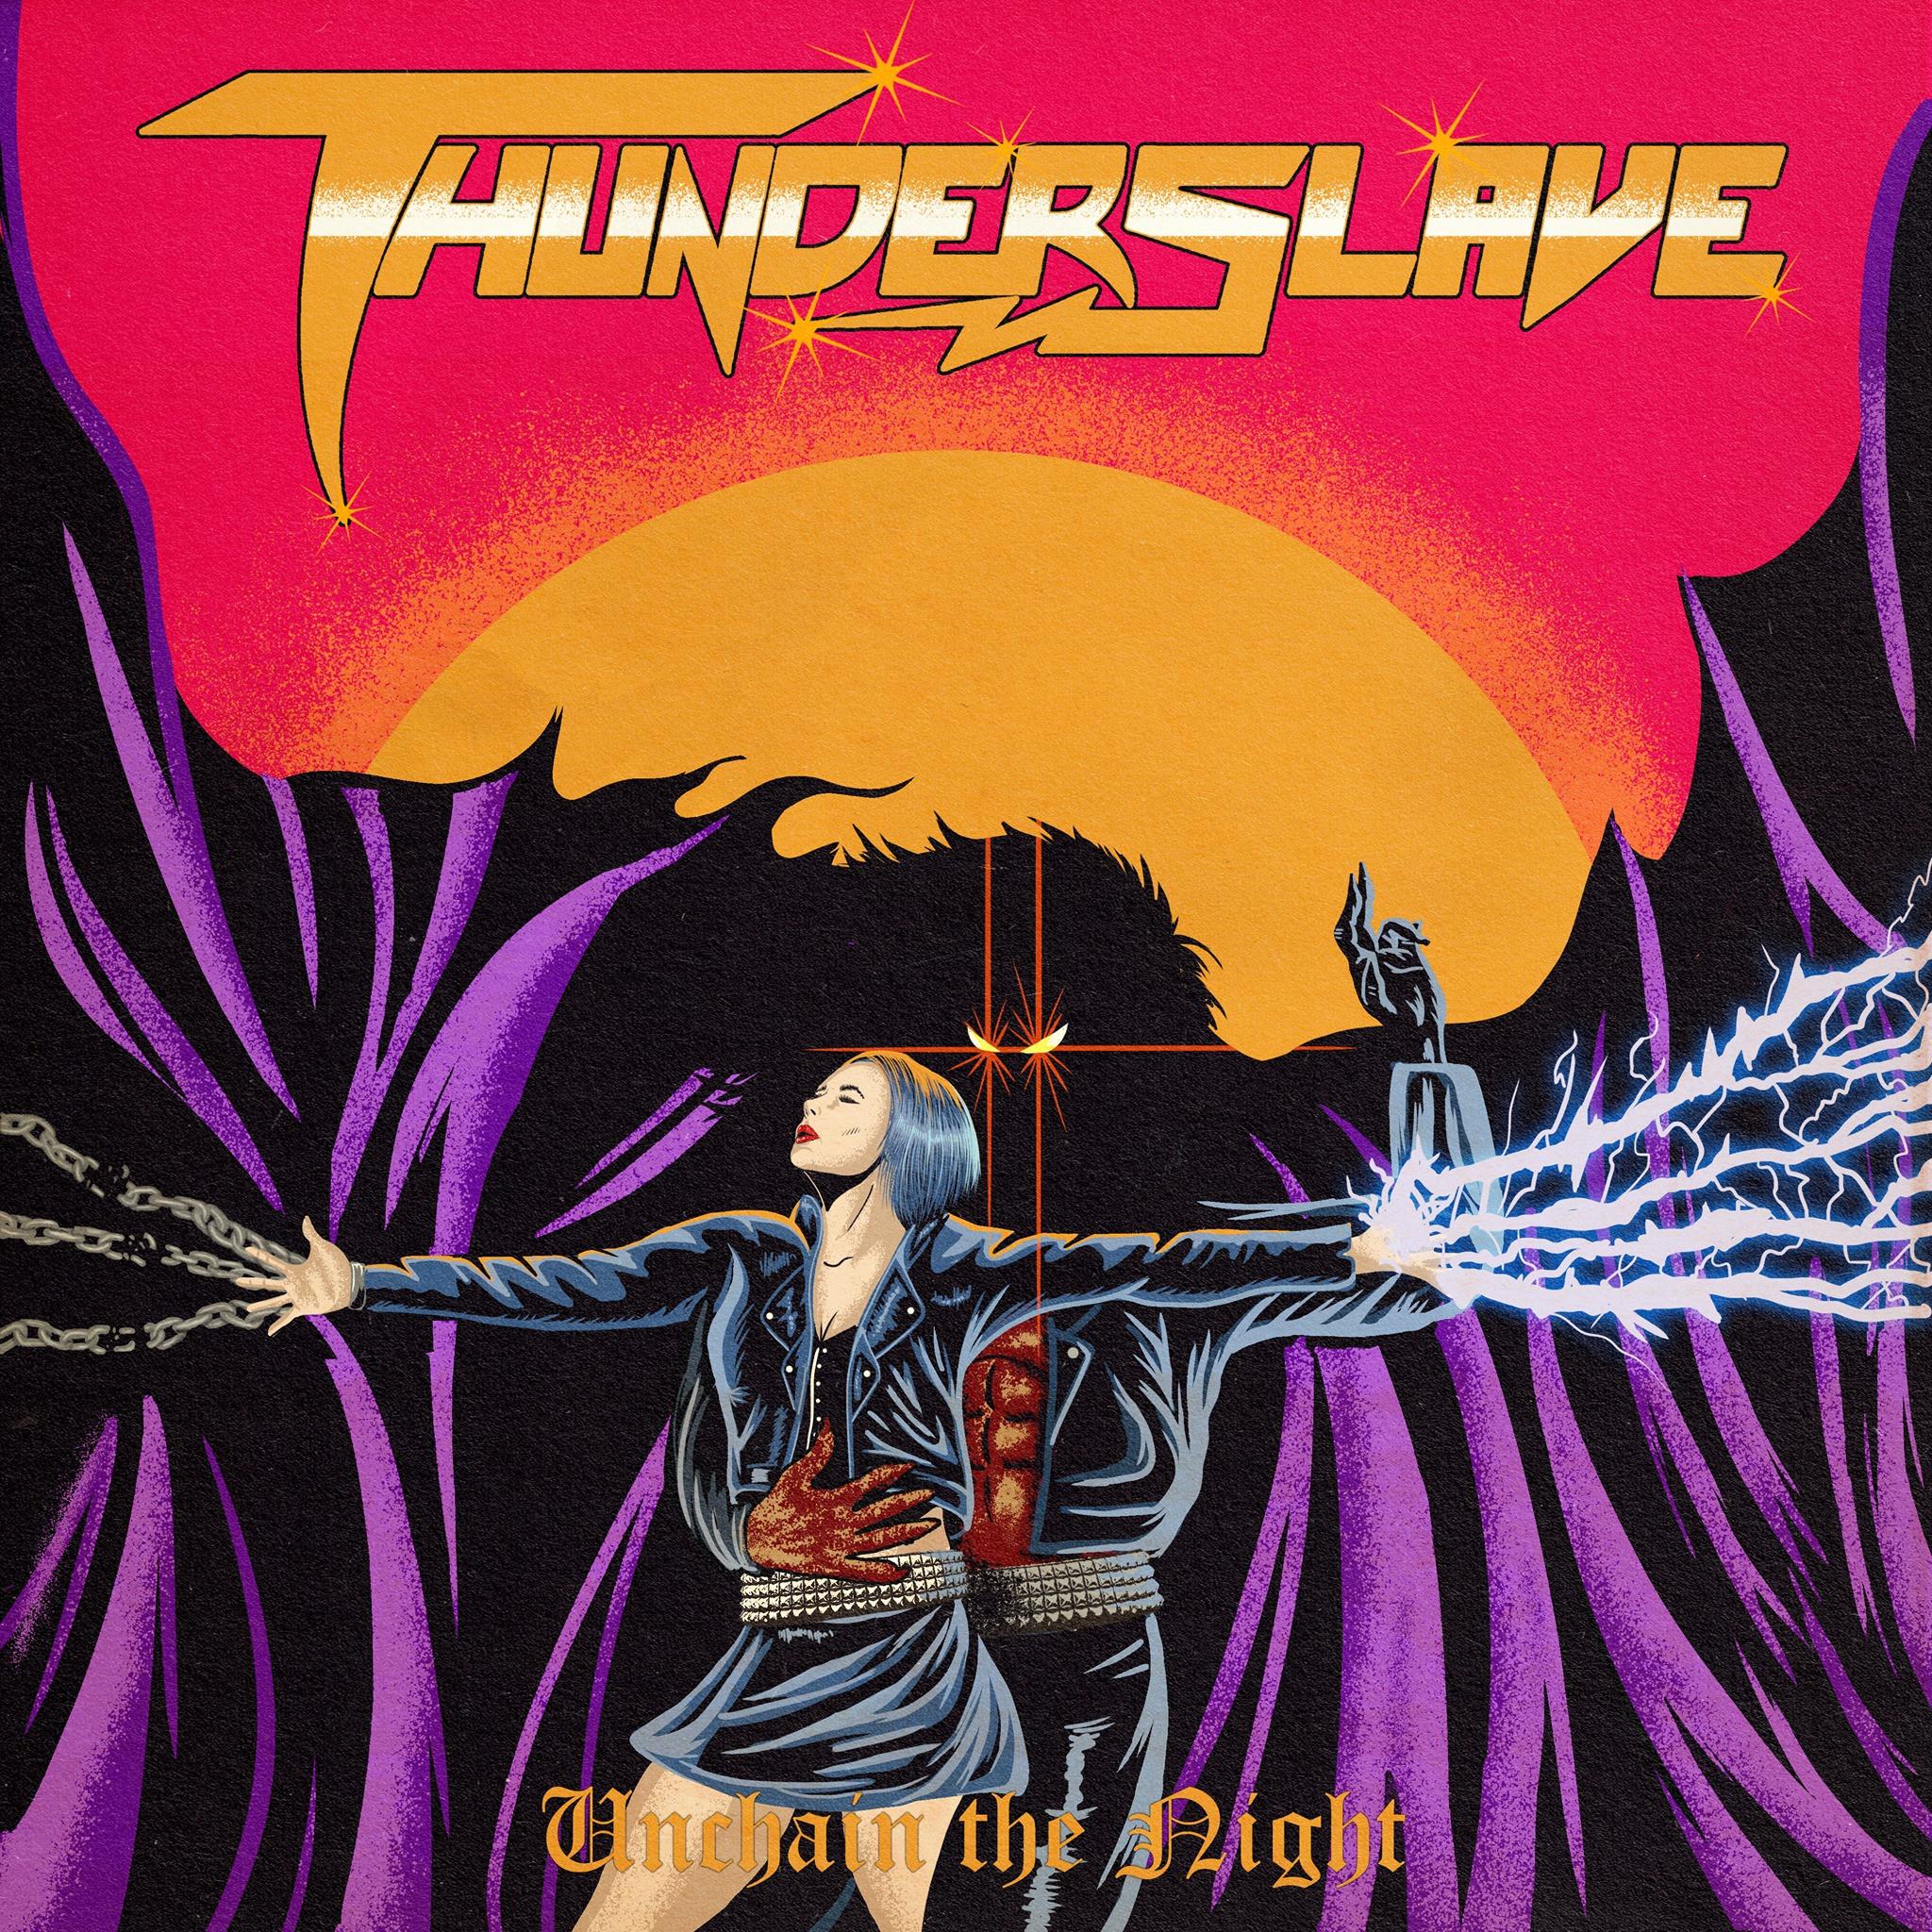 Thunderslave - ''Unchain The Night''